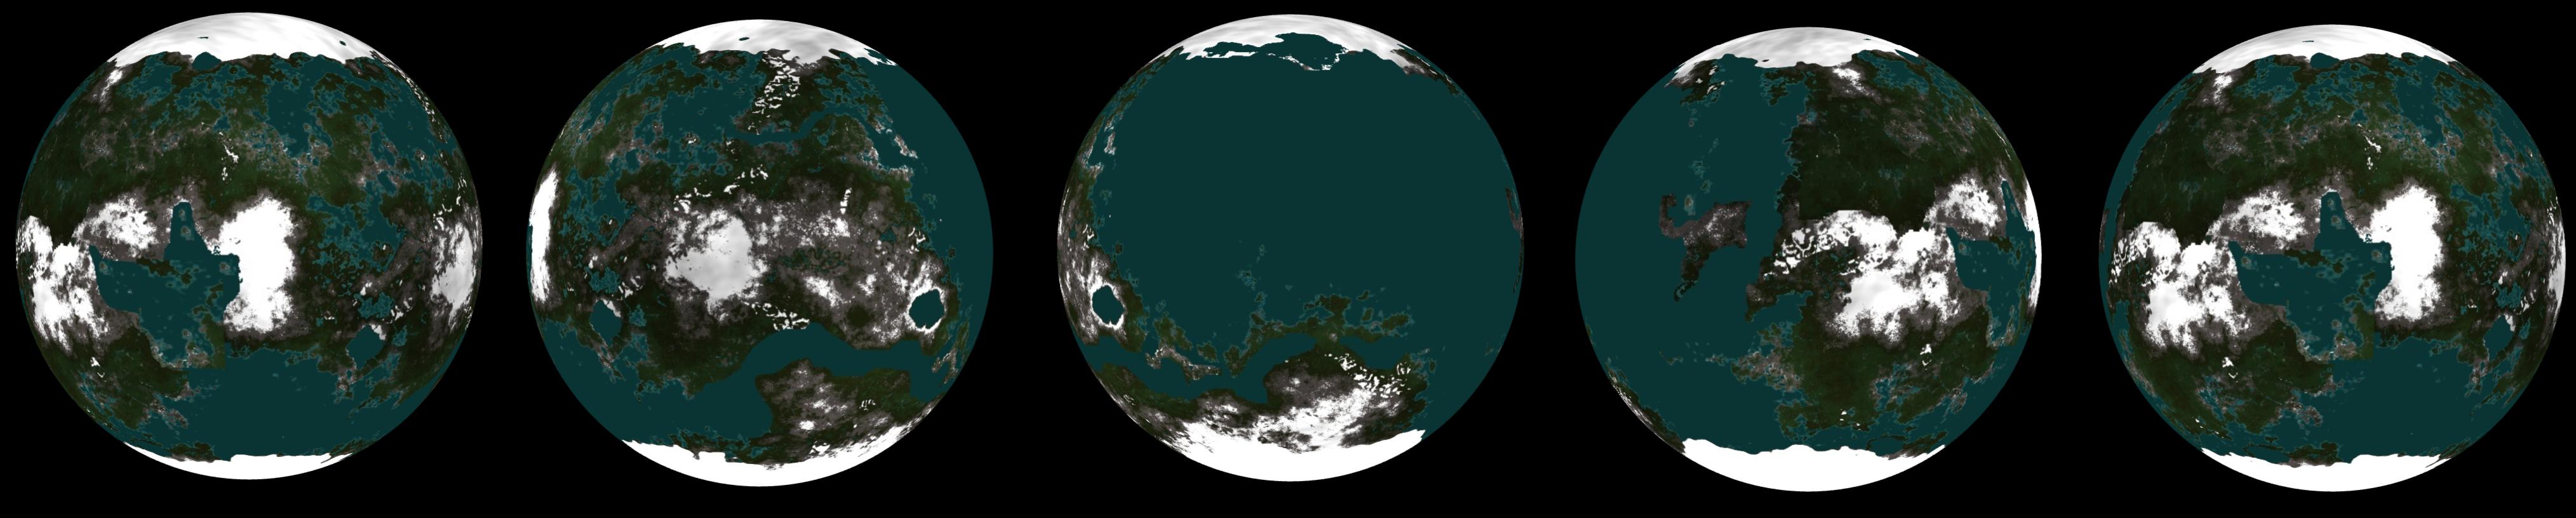 Barrow (Planet)